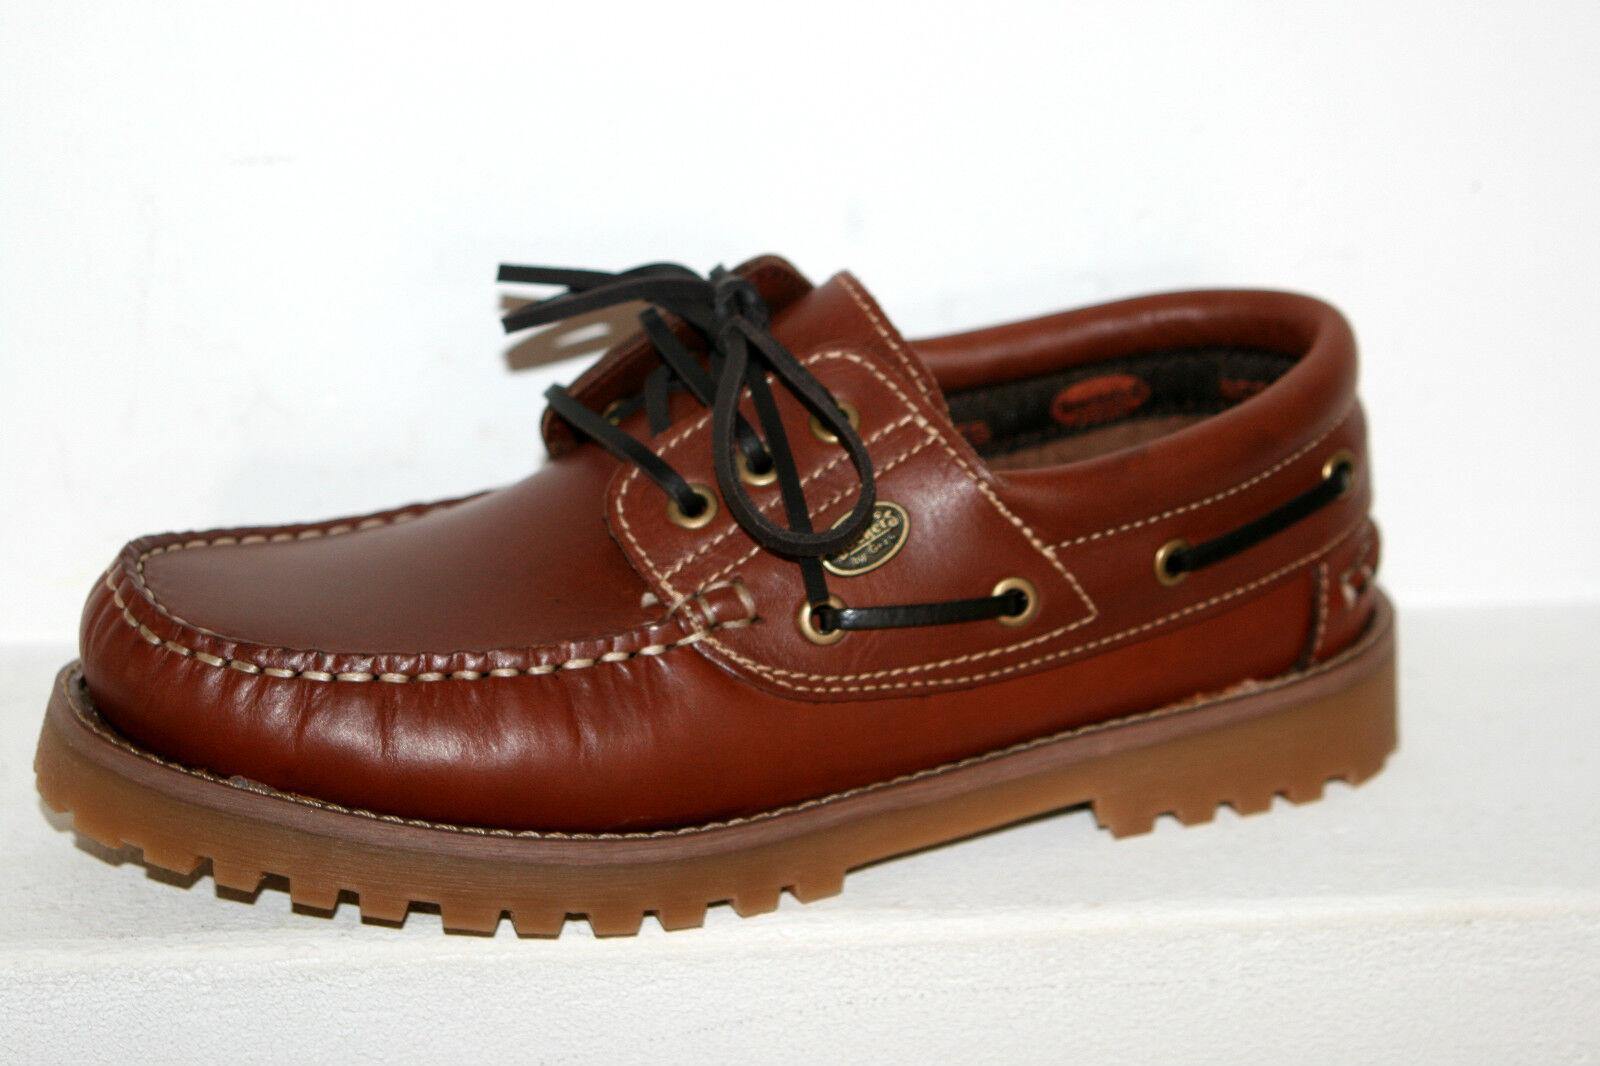 DOCKERS Schuhe Schnürschuhe Segelschuhe Mokassin braun - Reh Damen Herren